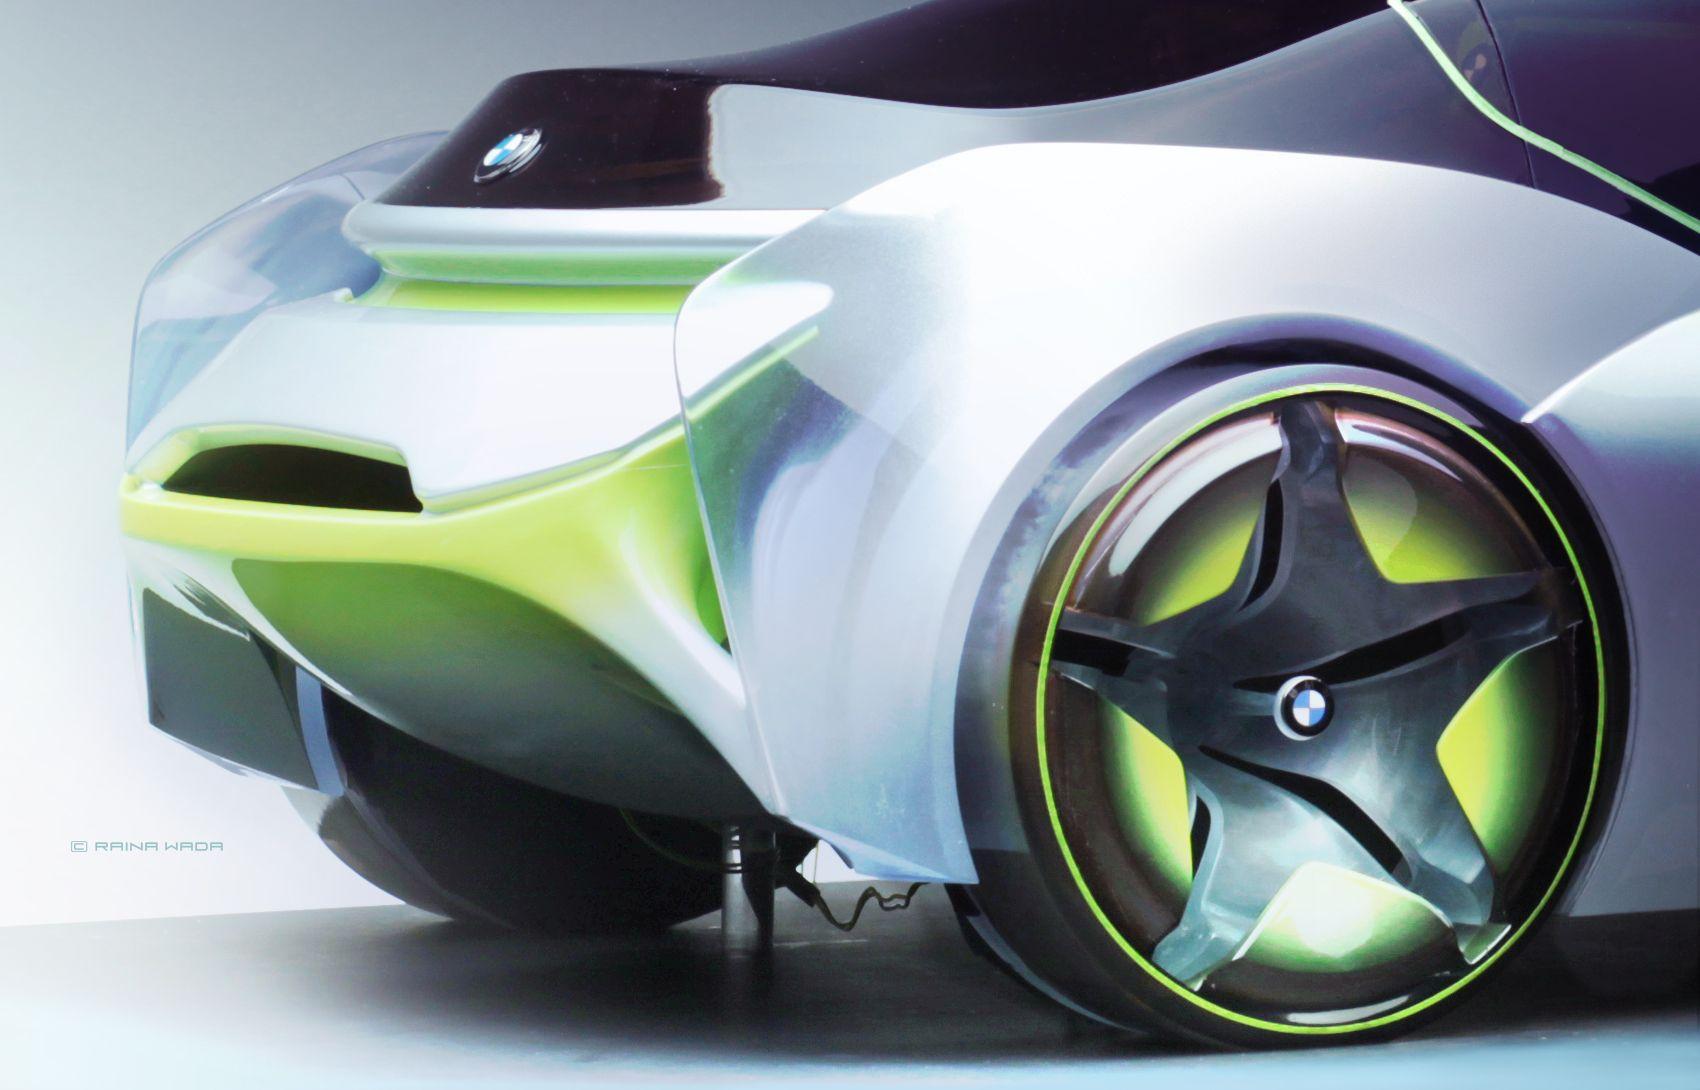 #CarDesign #CarConcept #AutomotiveDesign #BMW RapidMatrix by Raina Wada